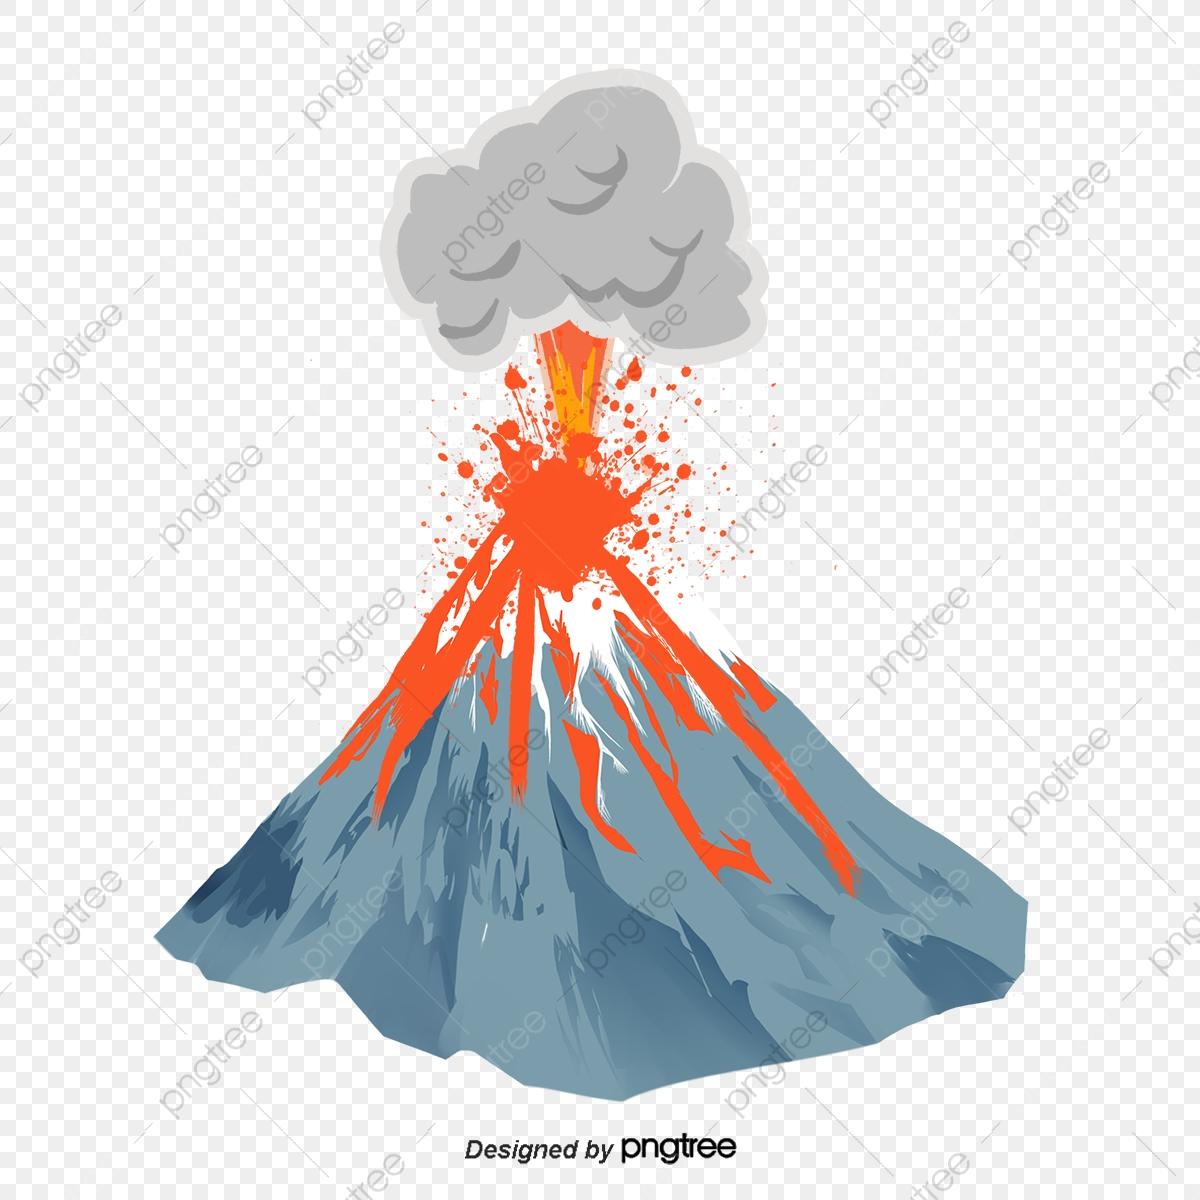 Volcano Eruption, Volcano Clipart, Creative, Cartoon PNG Transparent.